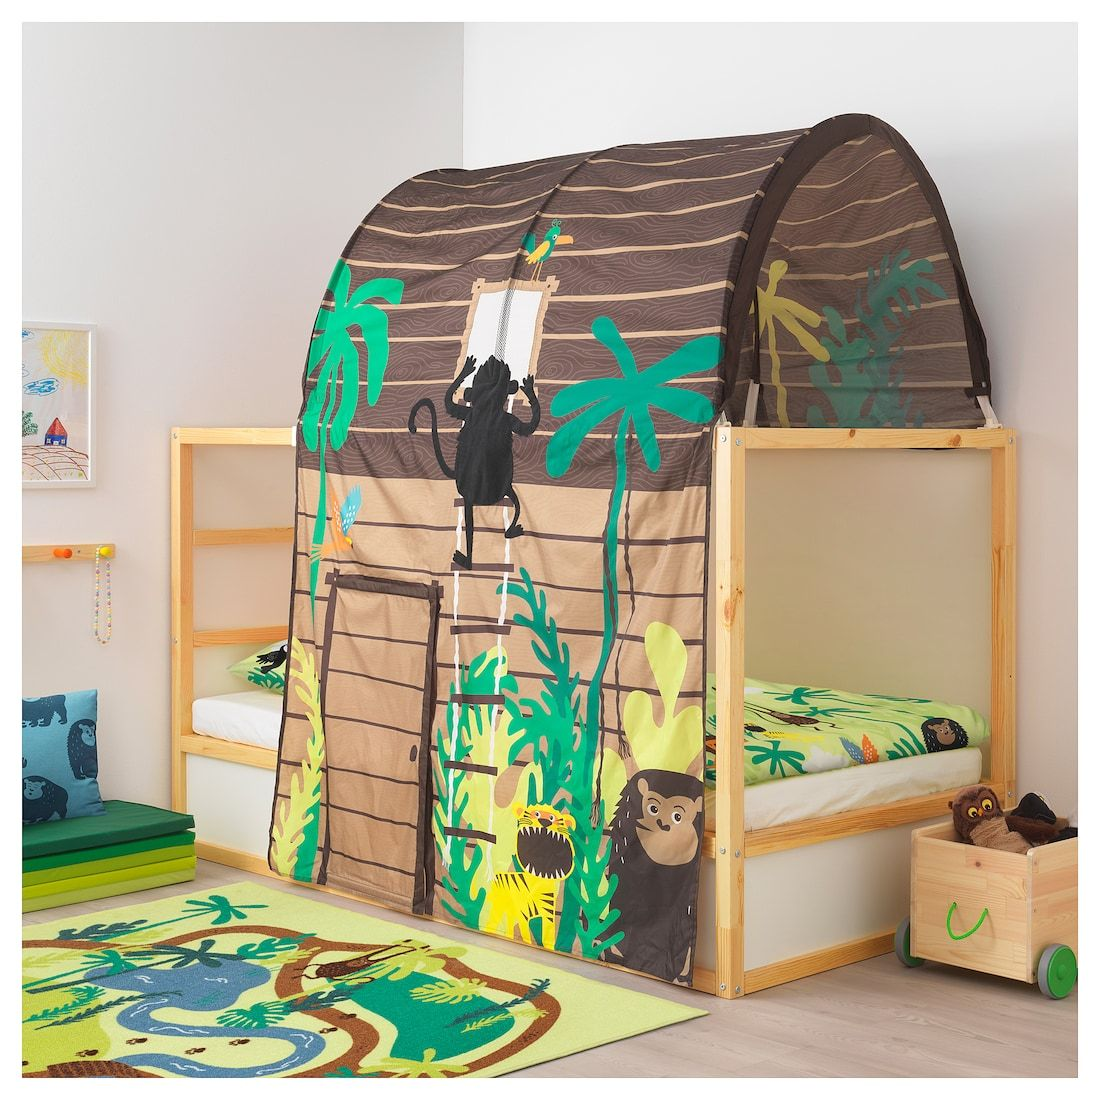 KURA Reversible bed white, pine Twin Bed tent, Ikea